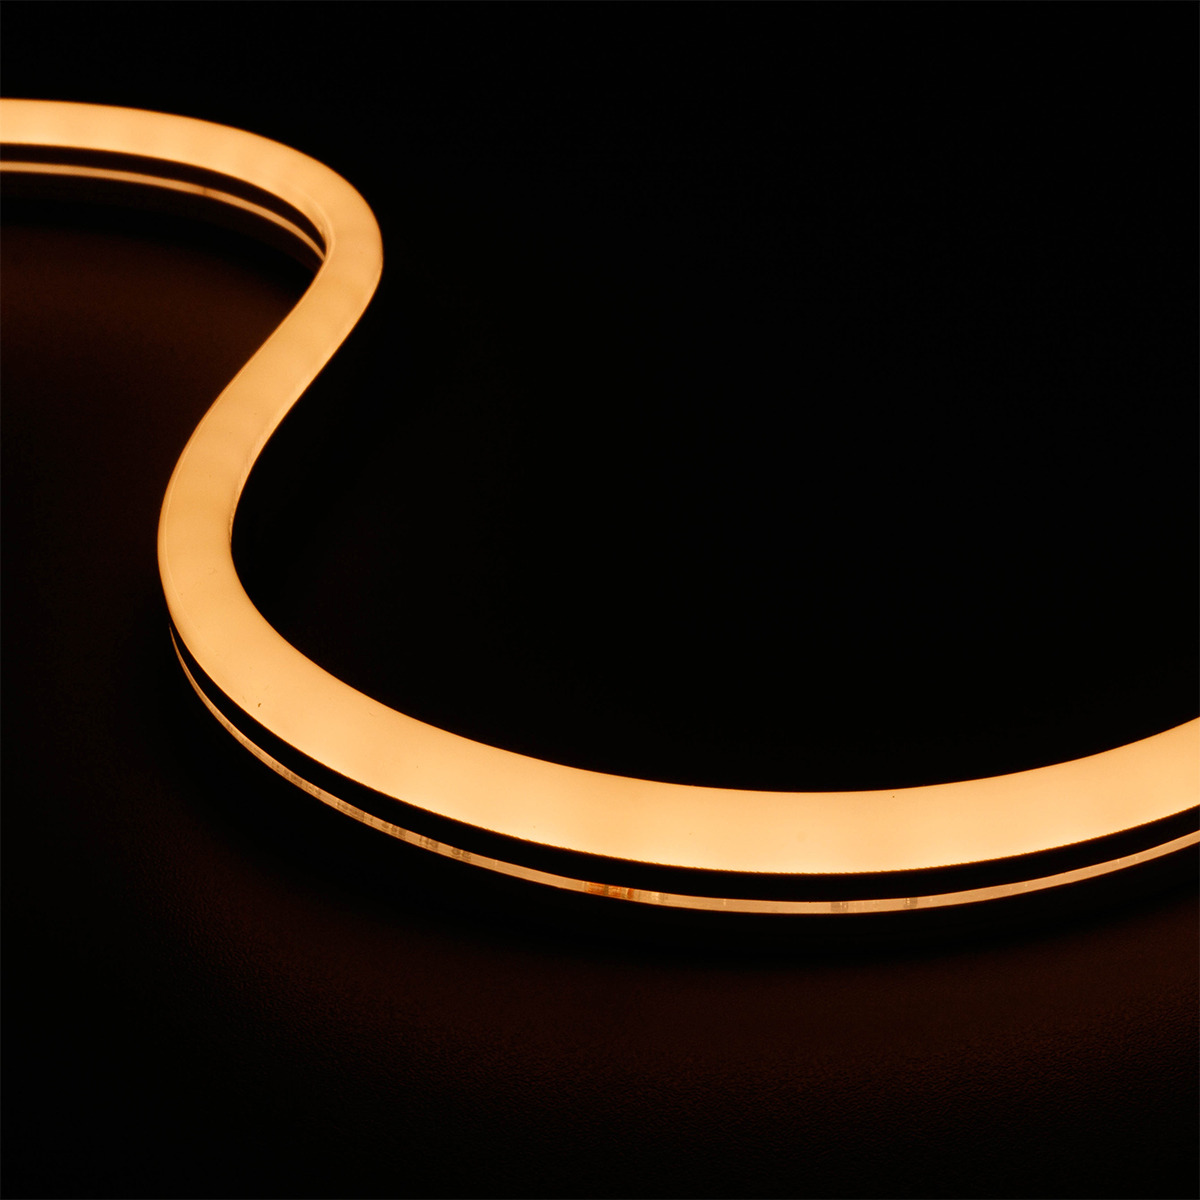 Neon Warmweiß 24V LED Streifen 5M 10W/m 84LED/m 7mm IP65 3000K